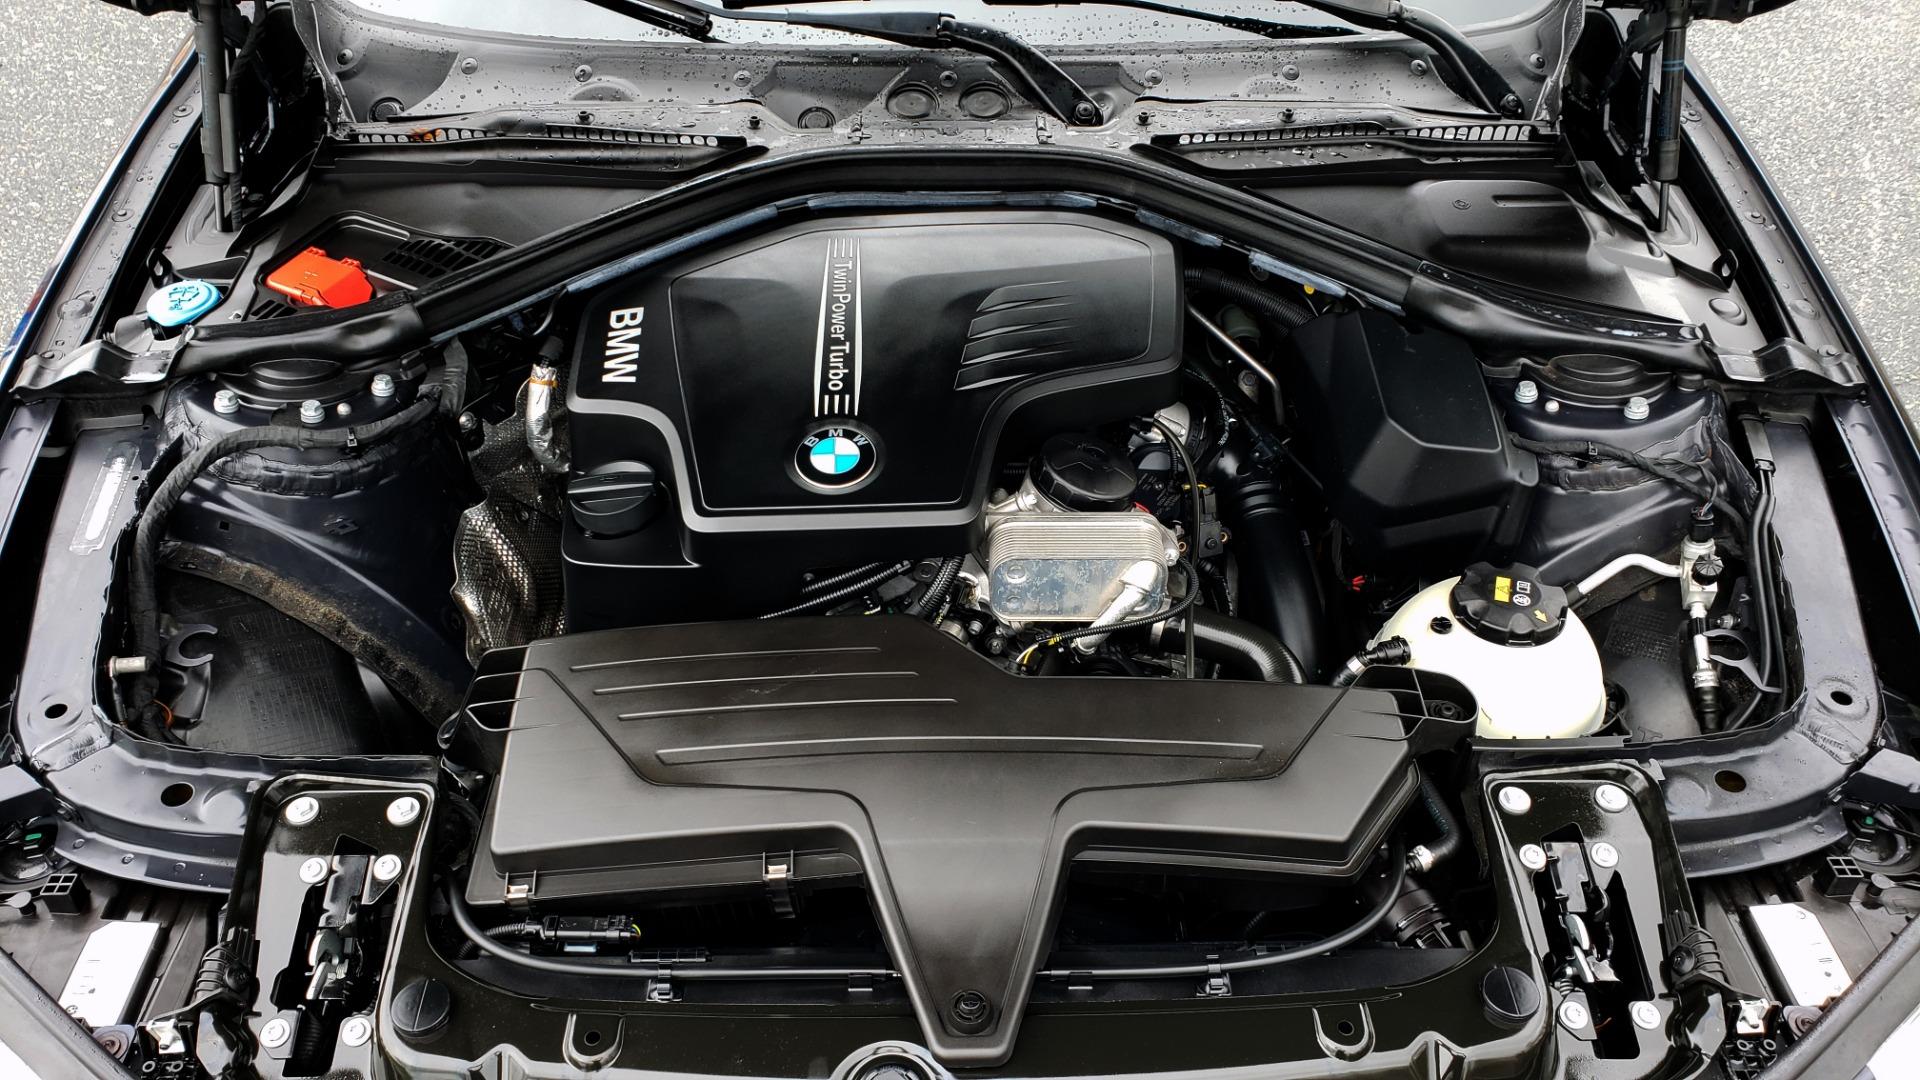 Used 2016 BMW 3 SERIES 328I PREMIUM PKG / DRVR ASST / SUNROOF / PARK ASST for sale Sold at Formula Imports in Charlotte NC 28227 11